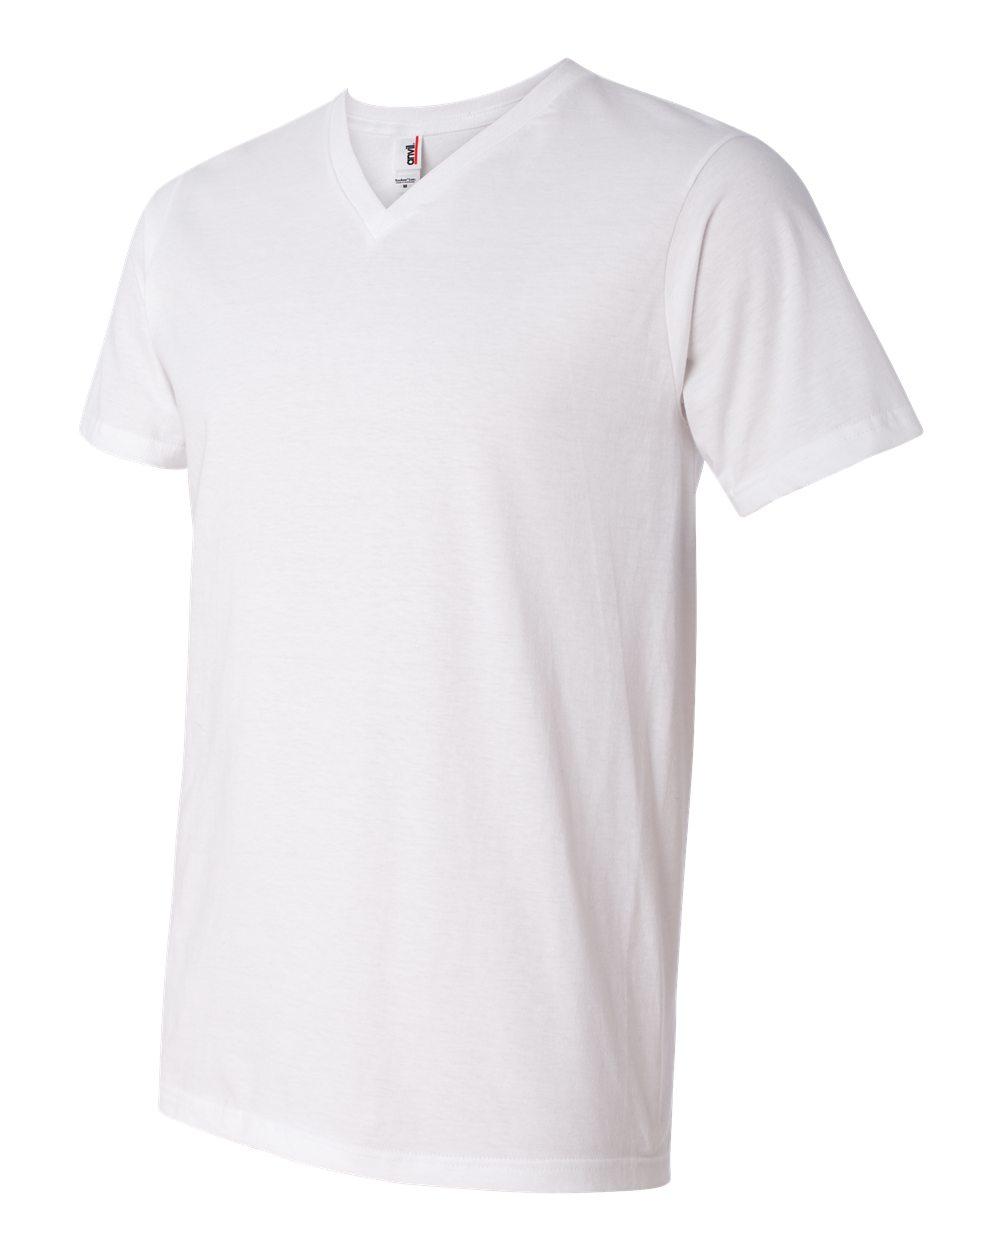 Anvil-Men-039-s-Lightweight-V-Neck-T-Shirt-982-S-3XL thumbnail 30